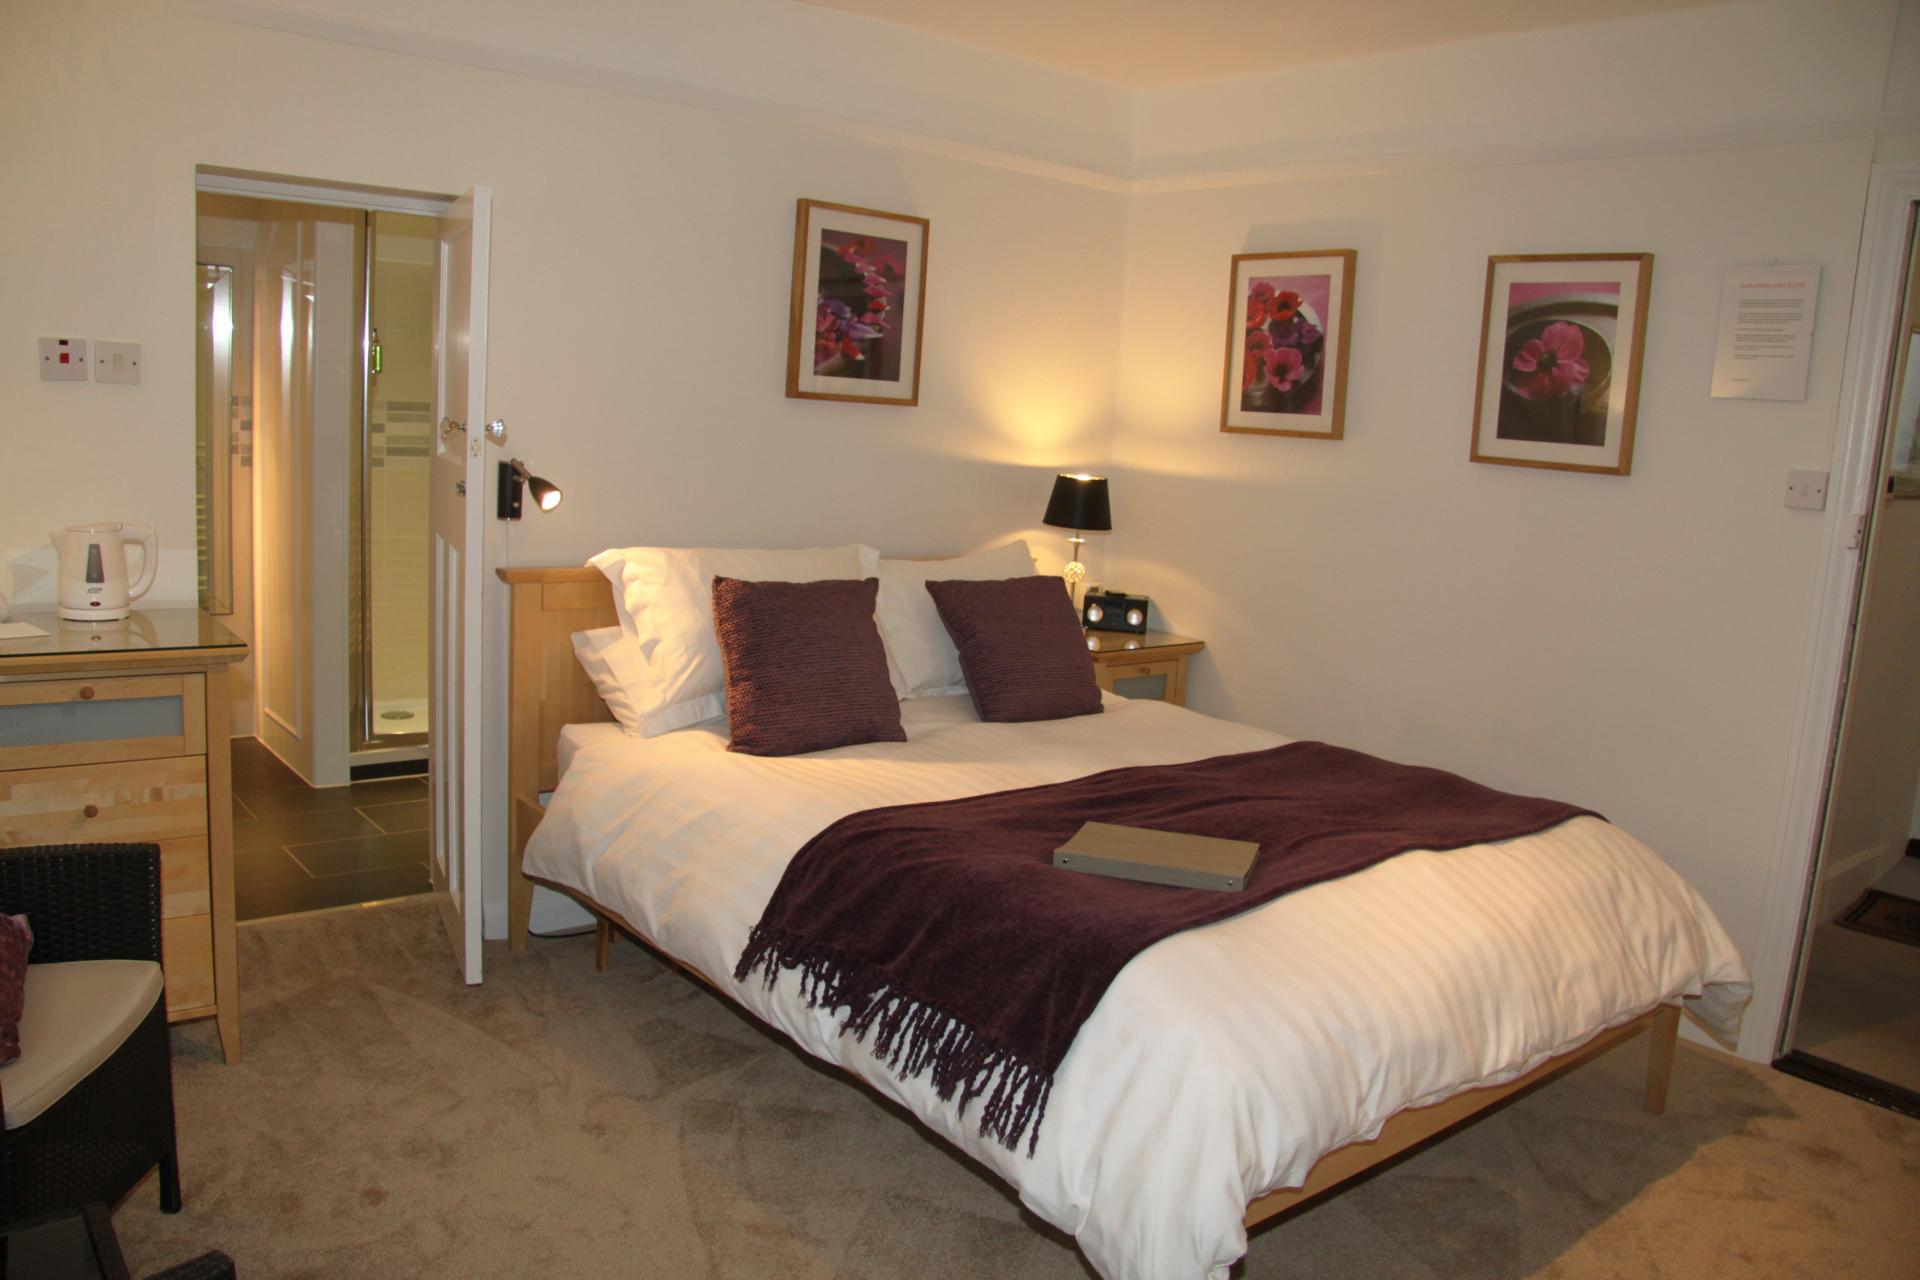 Double room with En suite shower room - Breakfast included